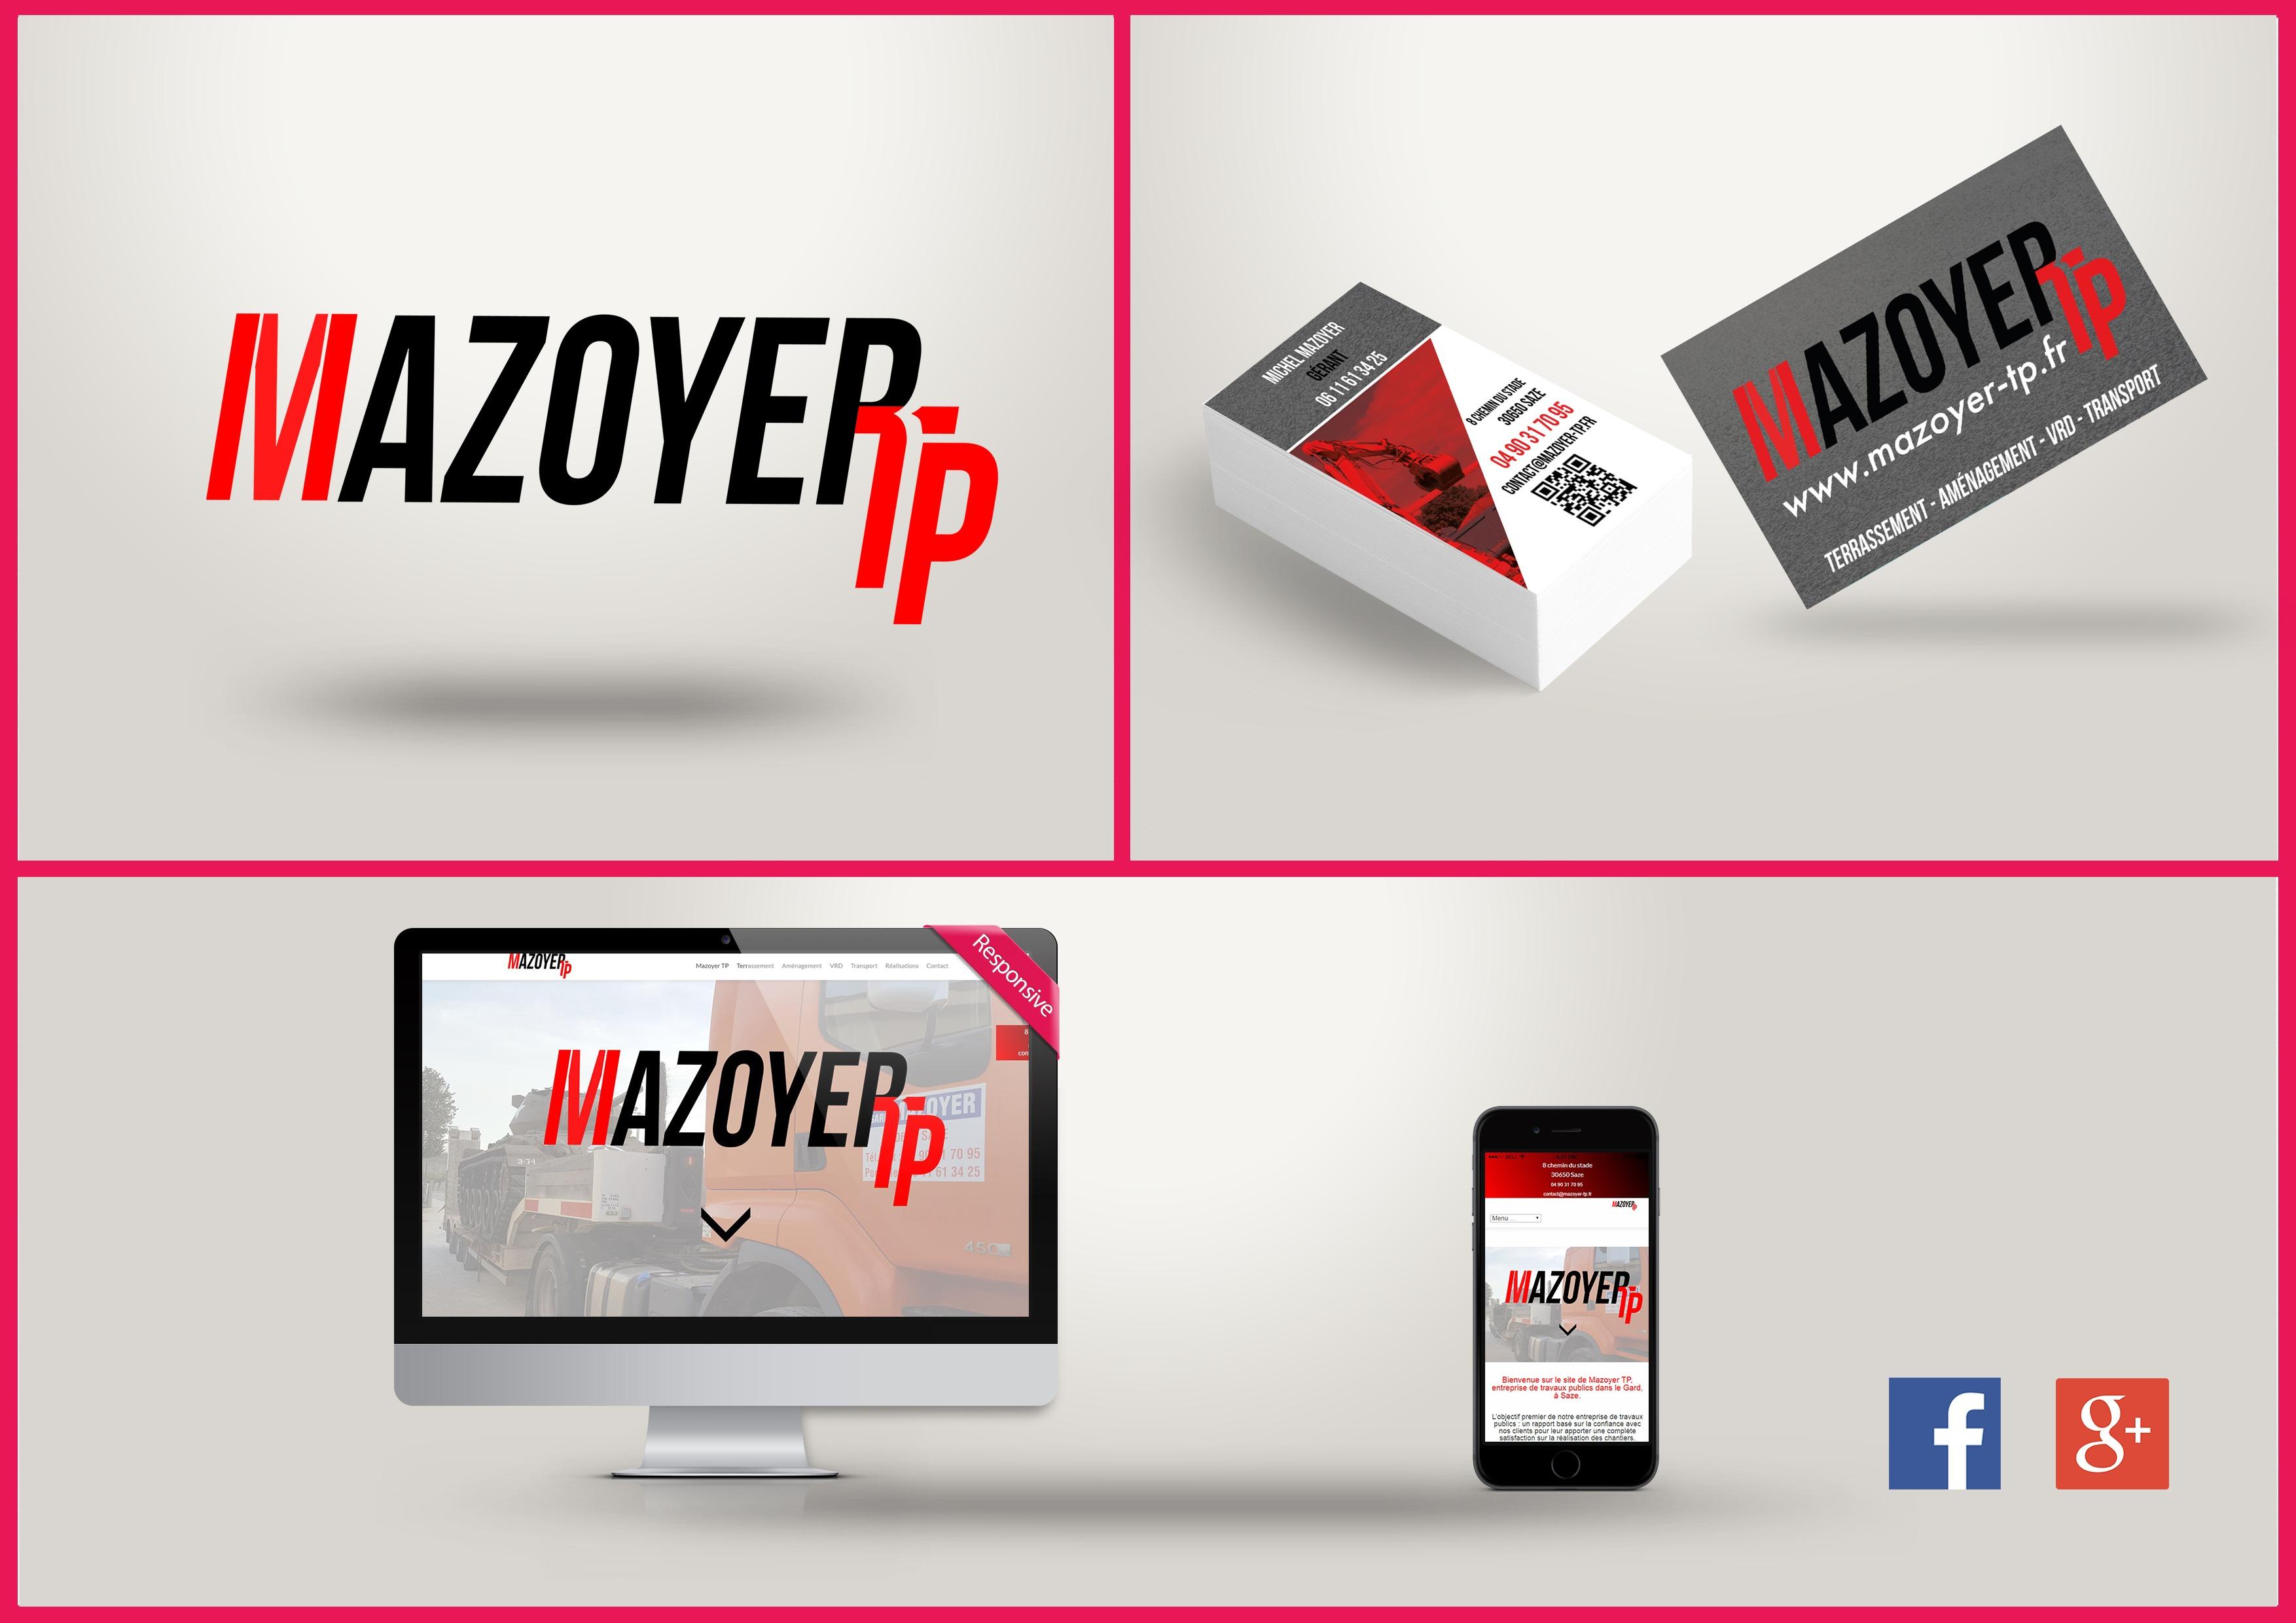 Mazoyer TP